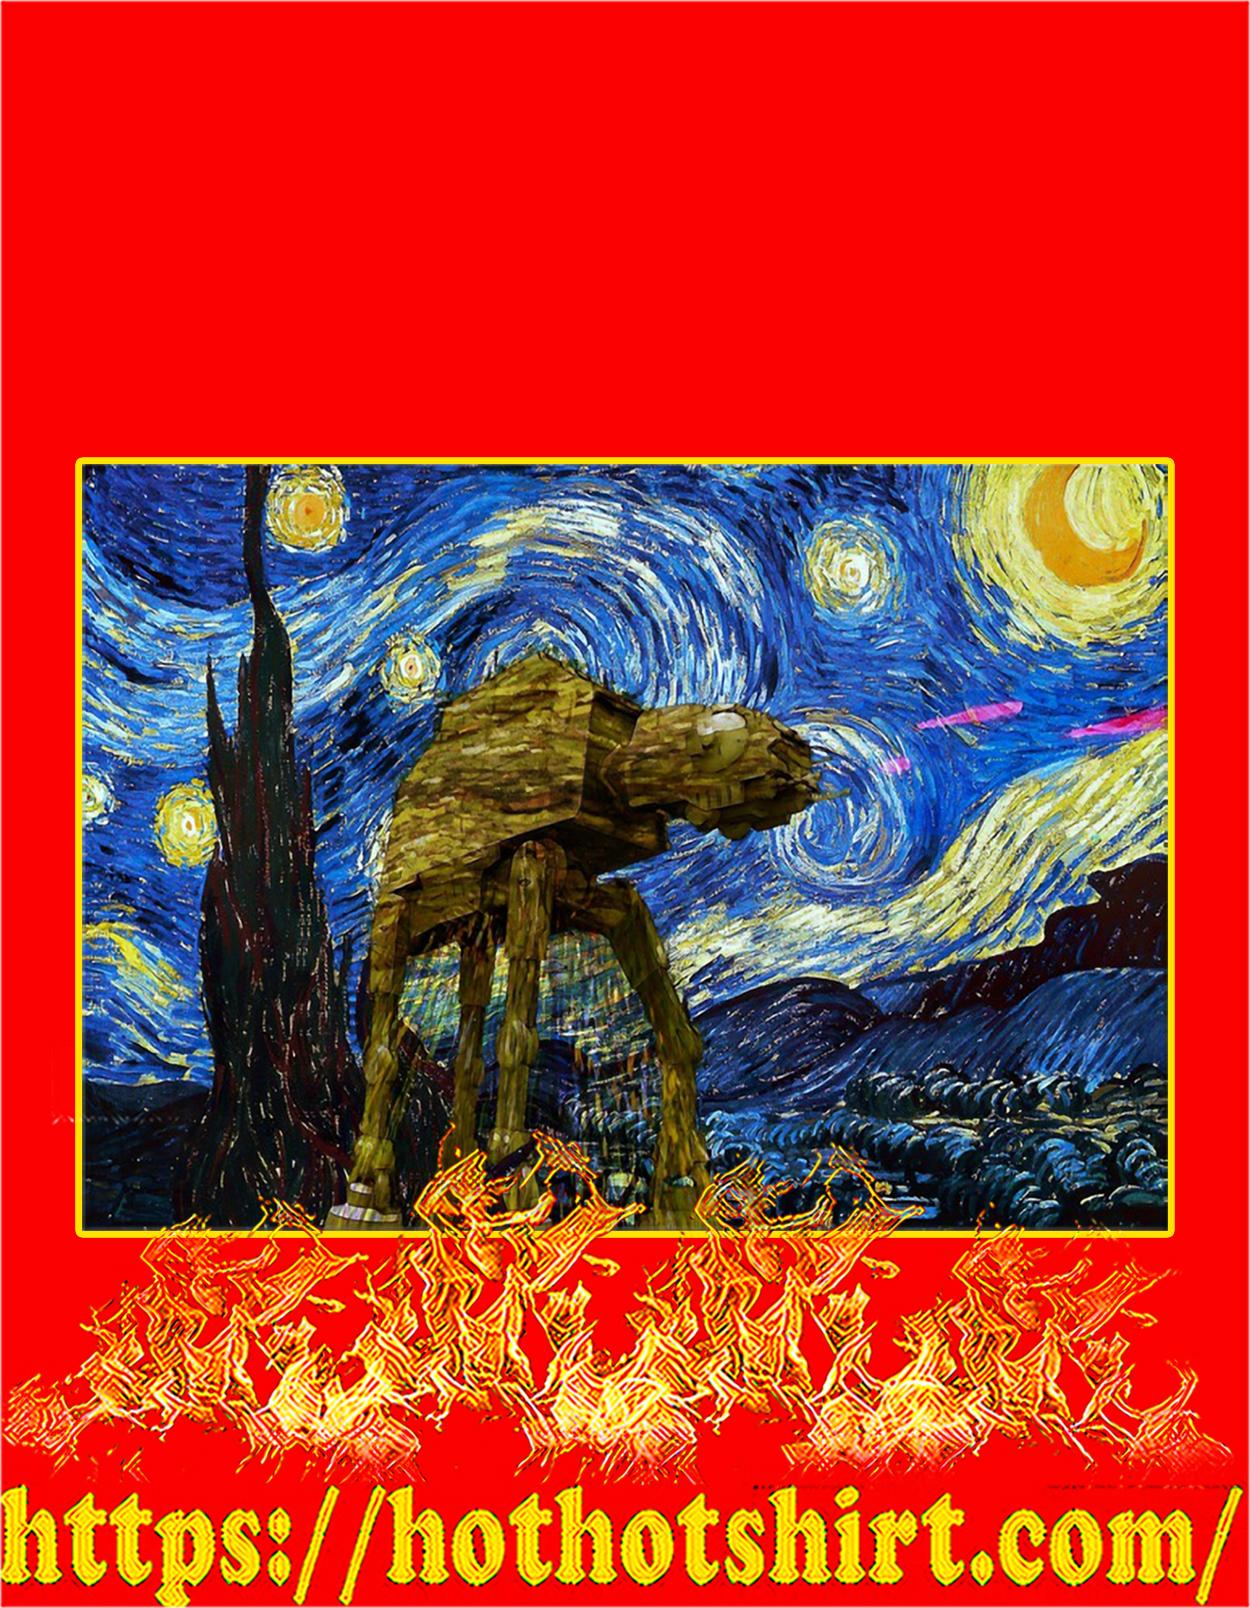 ATAT starry night van gogh poster - A3